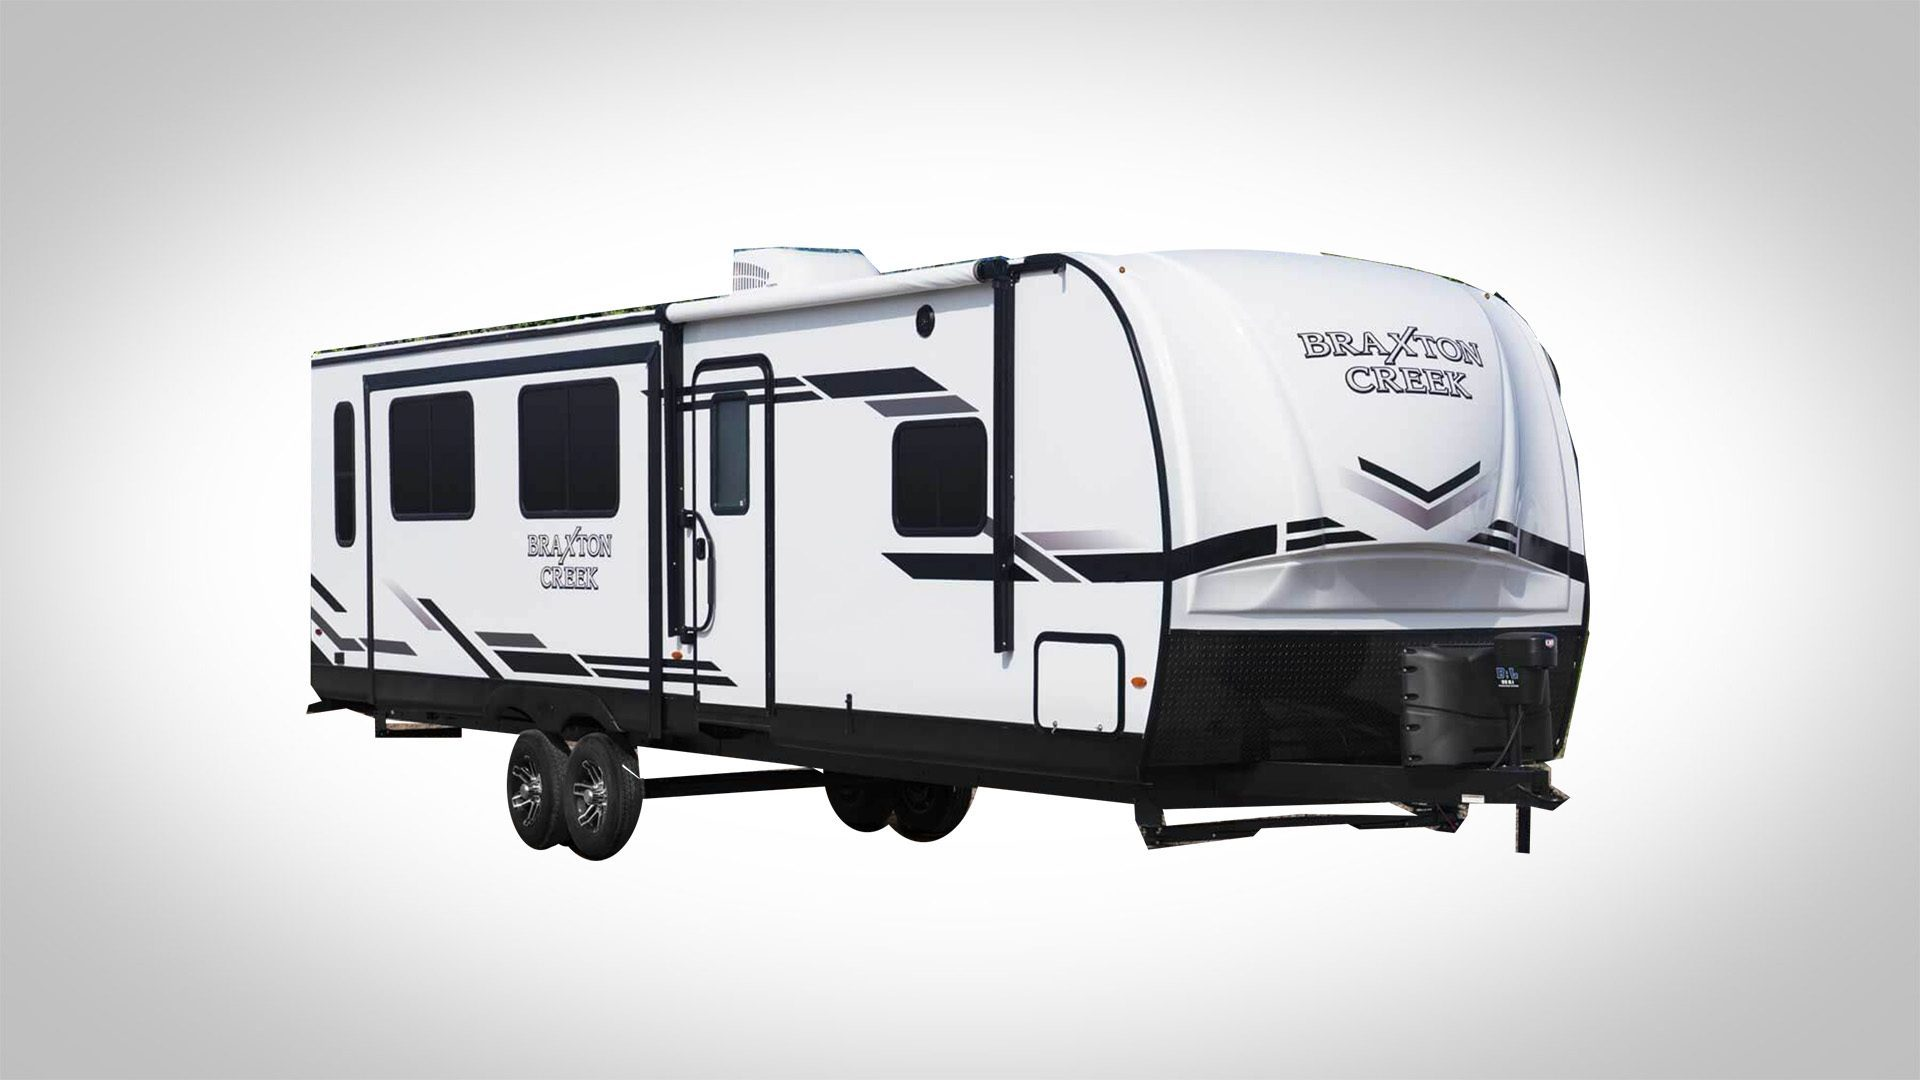 braxton-creek-trailer